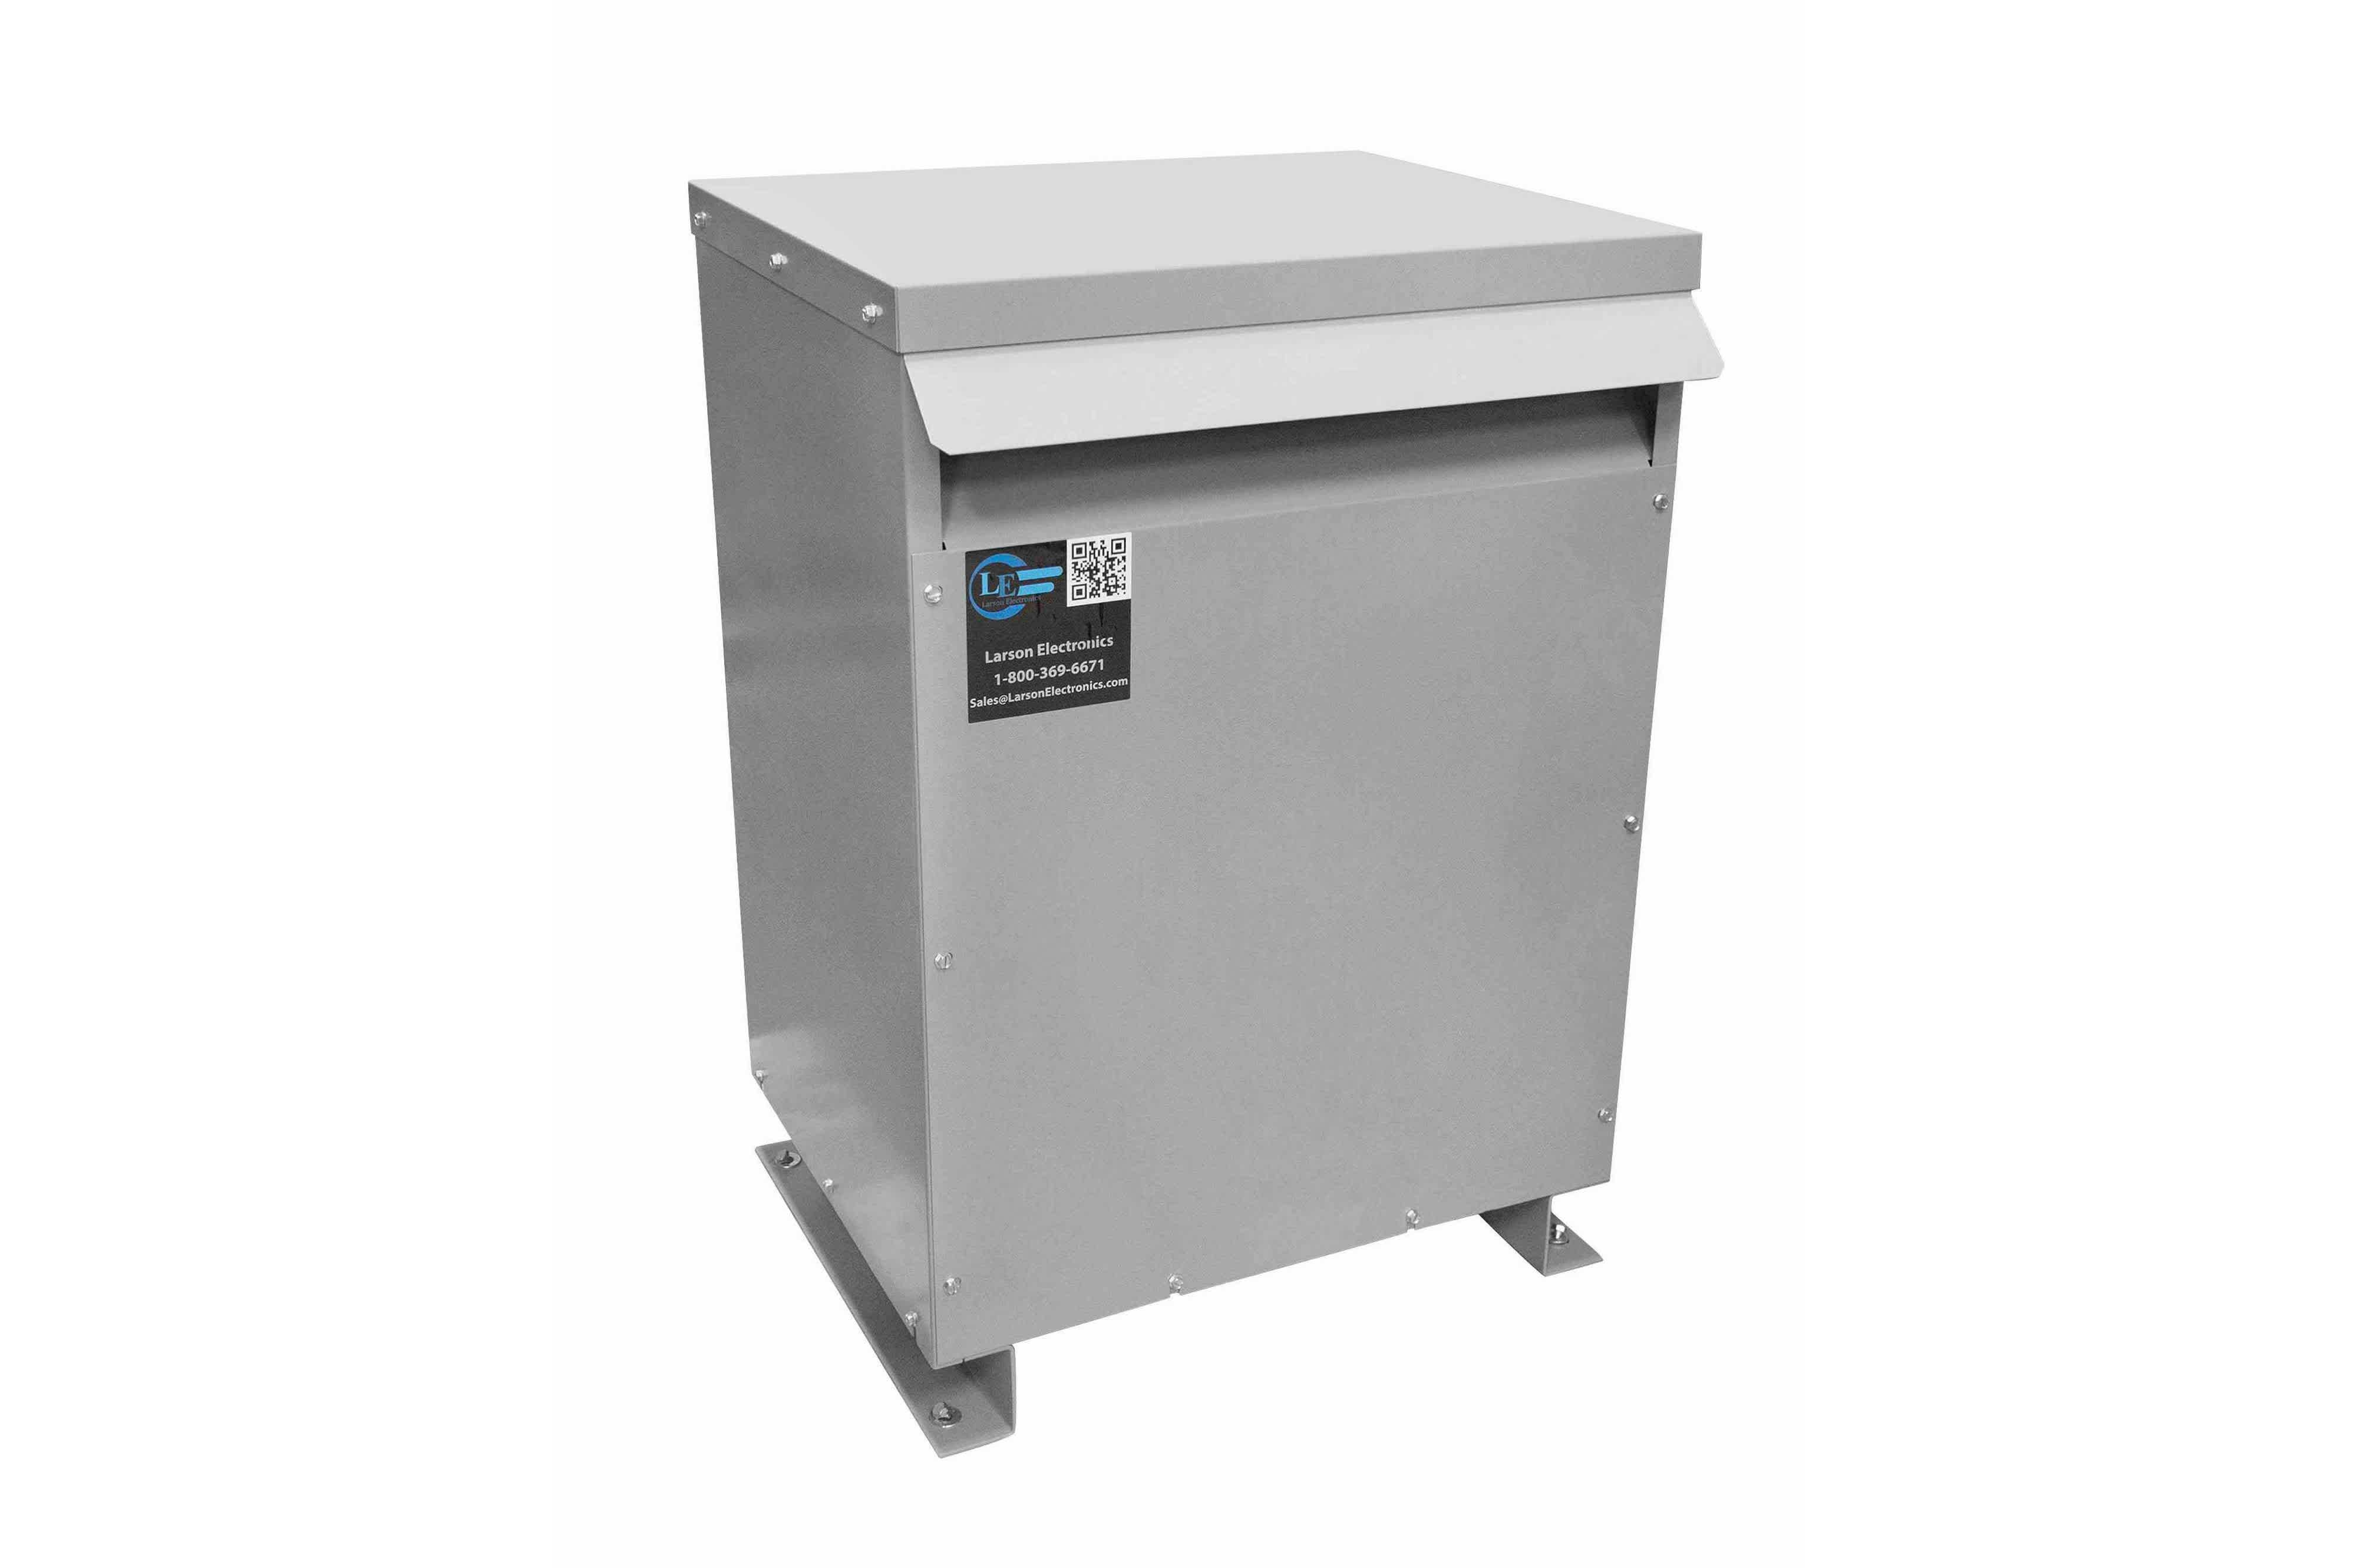 10 kVA 3PH Isolation Transformer, 480V Wye Primary, 208V Delta Secondary, N3R, Ventilated, 60 Hz